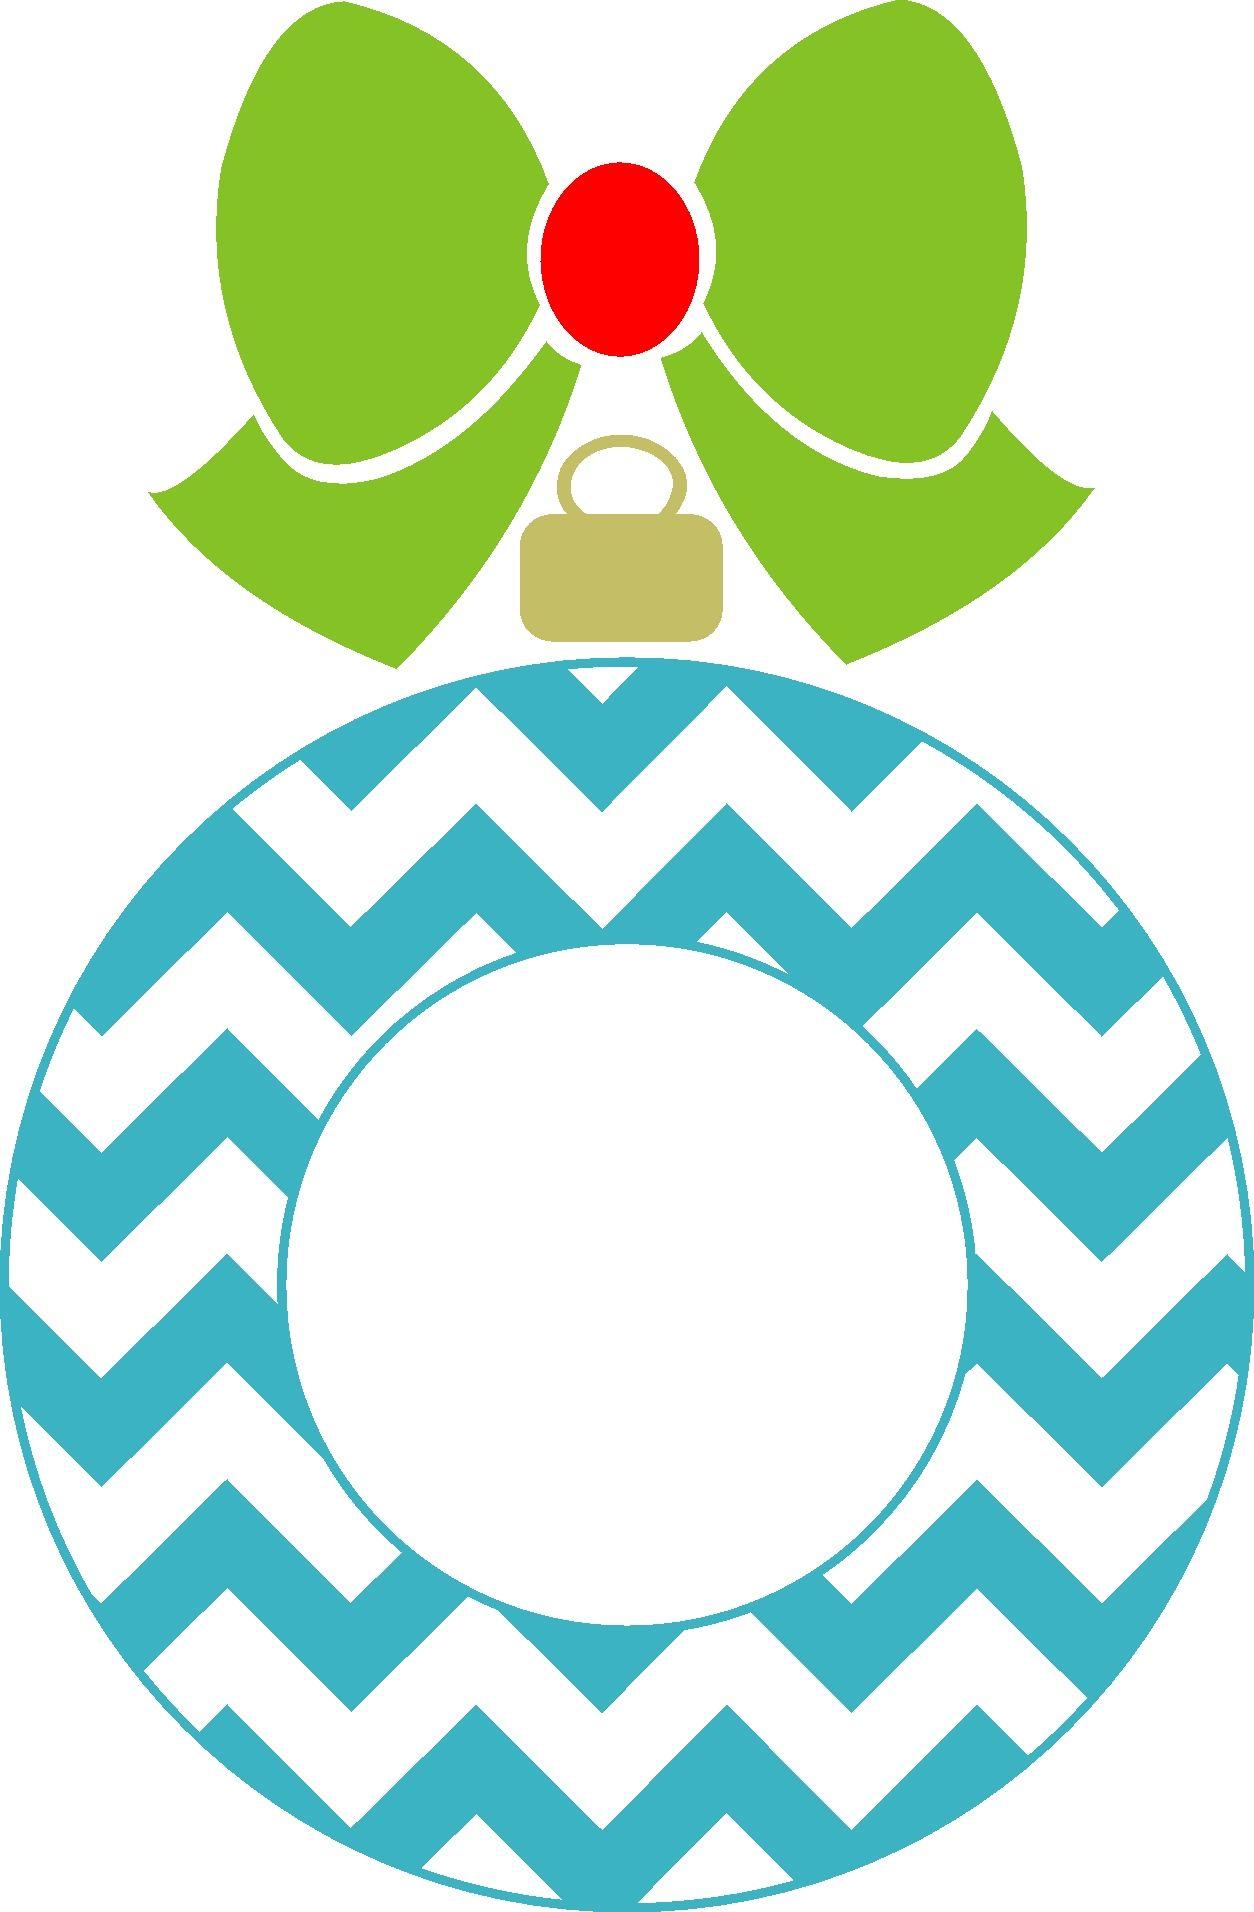 Chevron Christmas Ornament Monogram Frame Silhouette